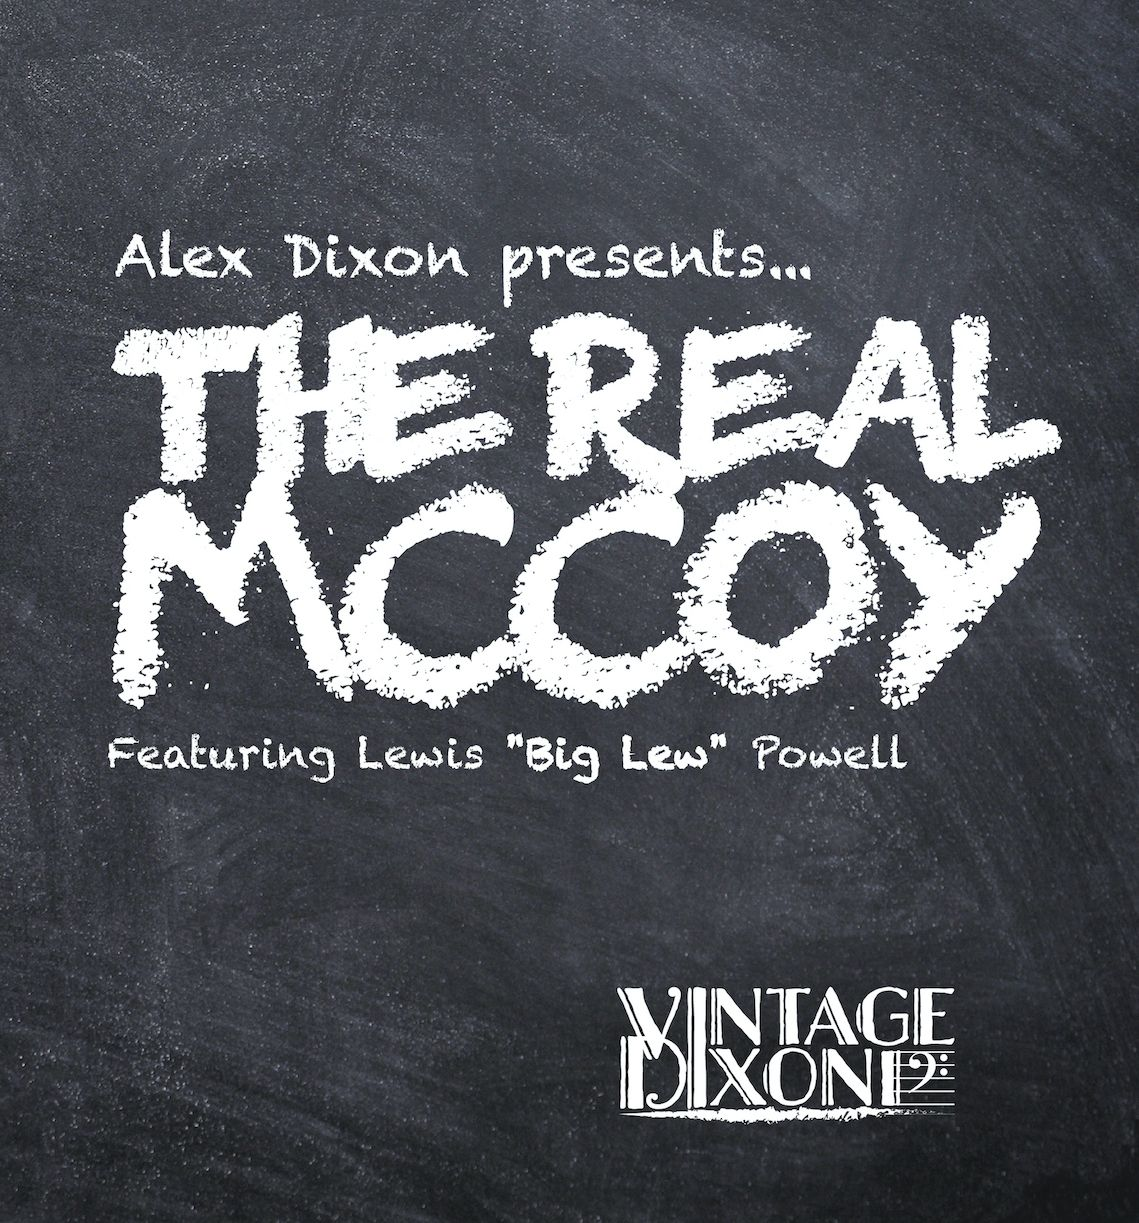 Alex Dixon's Vintage Dixon